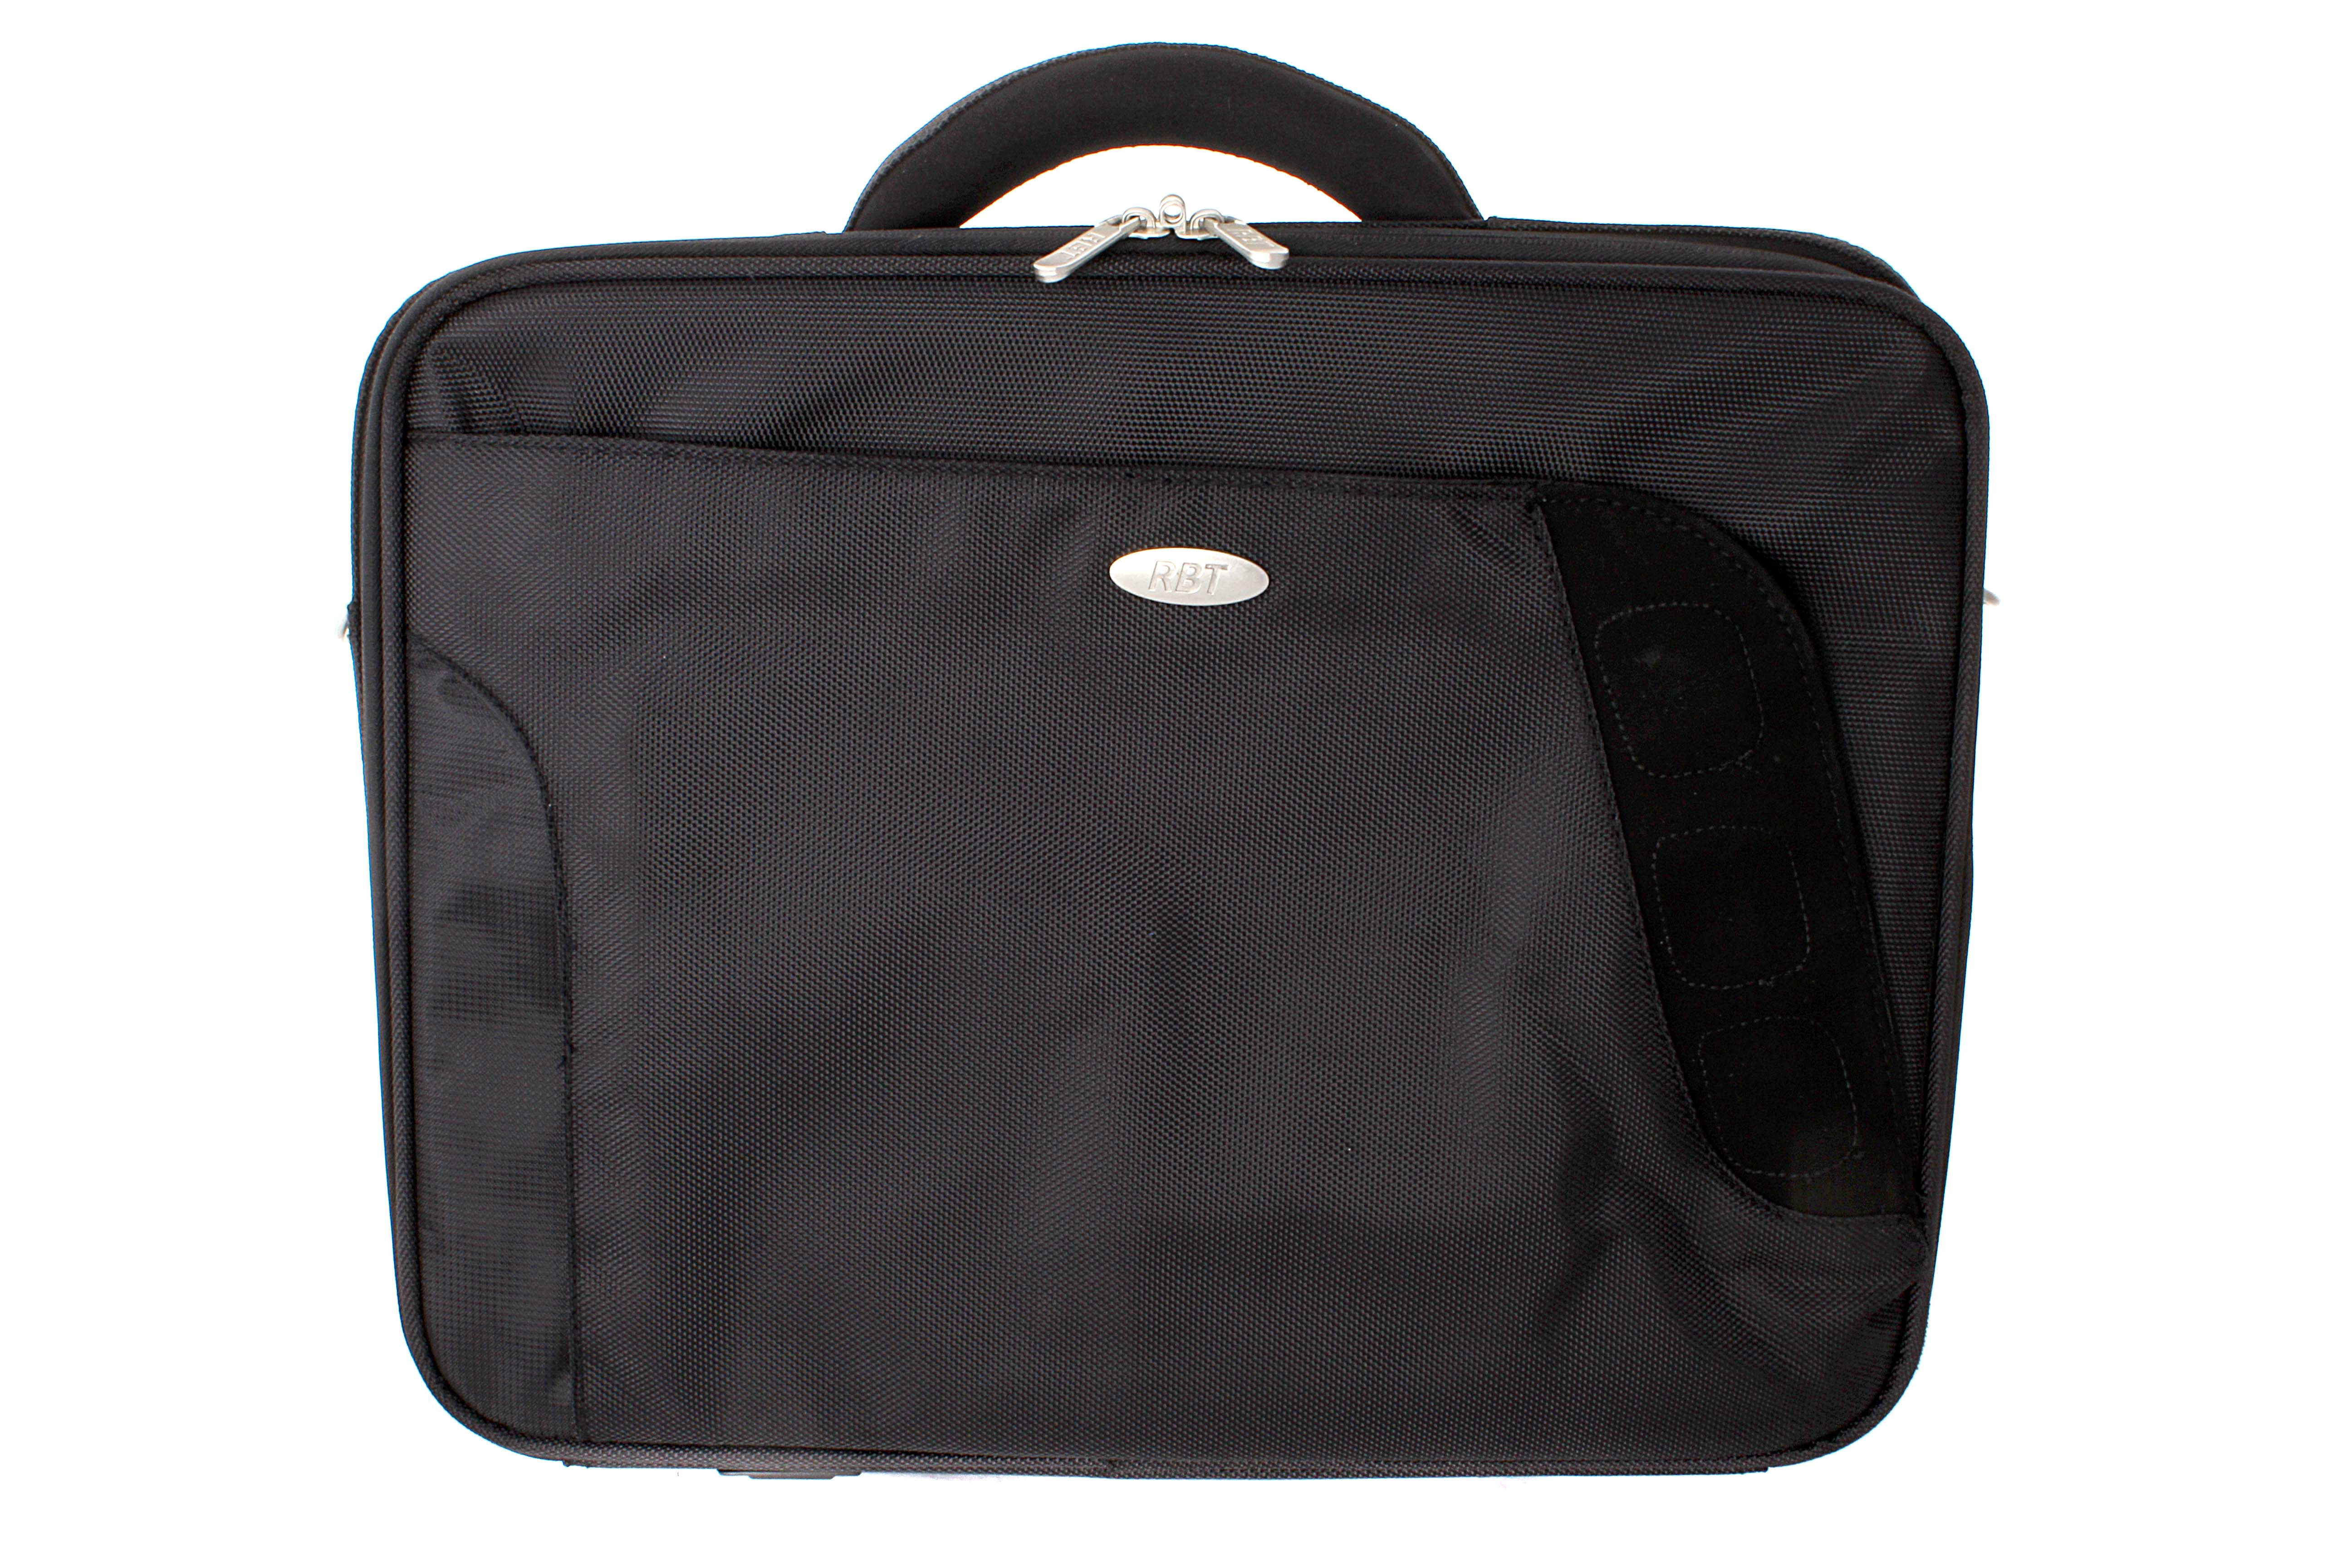 Кейс для ноутбука Рбт Real Brand Technics 1299.000